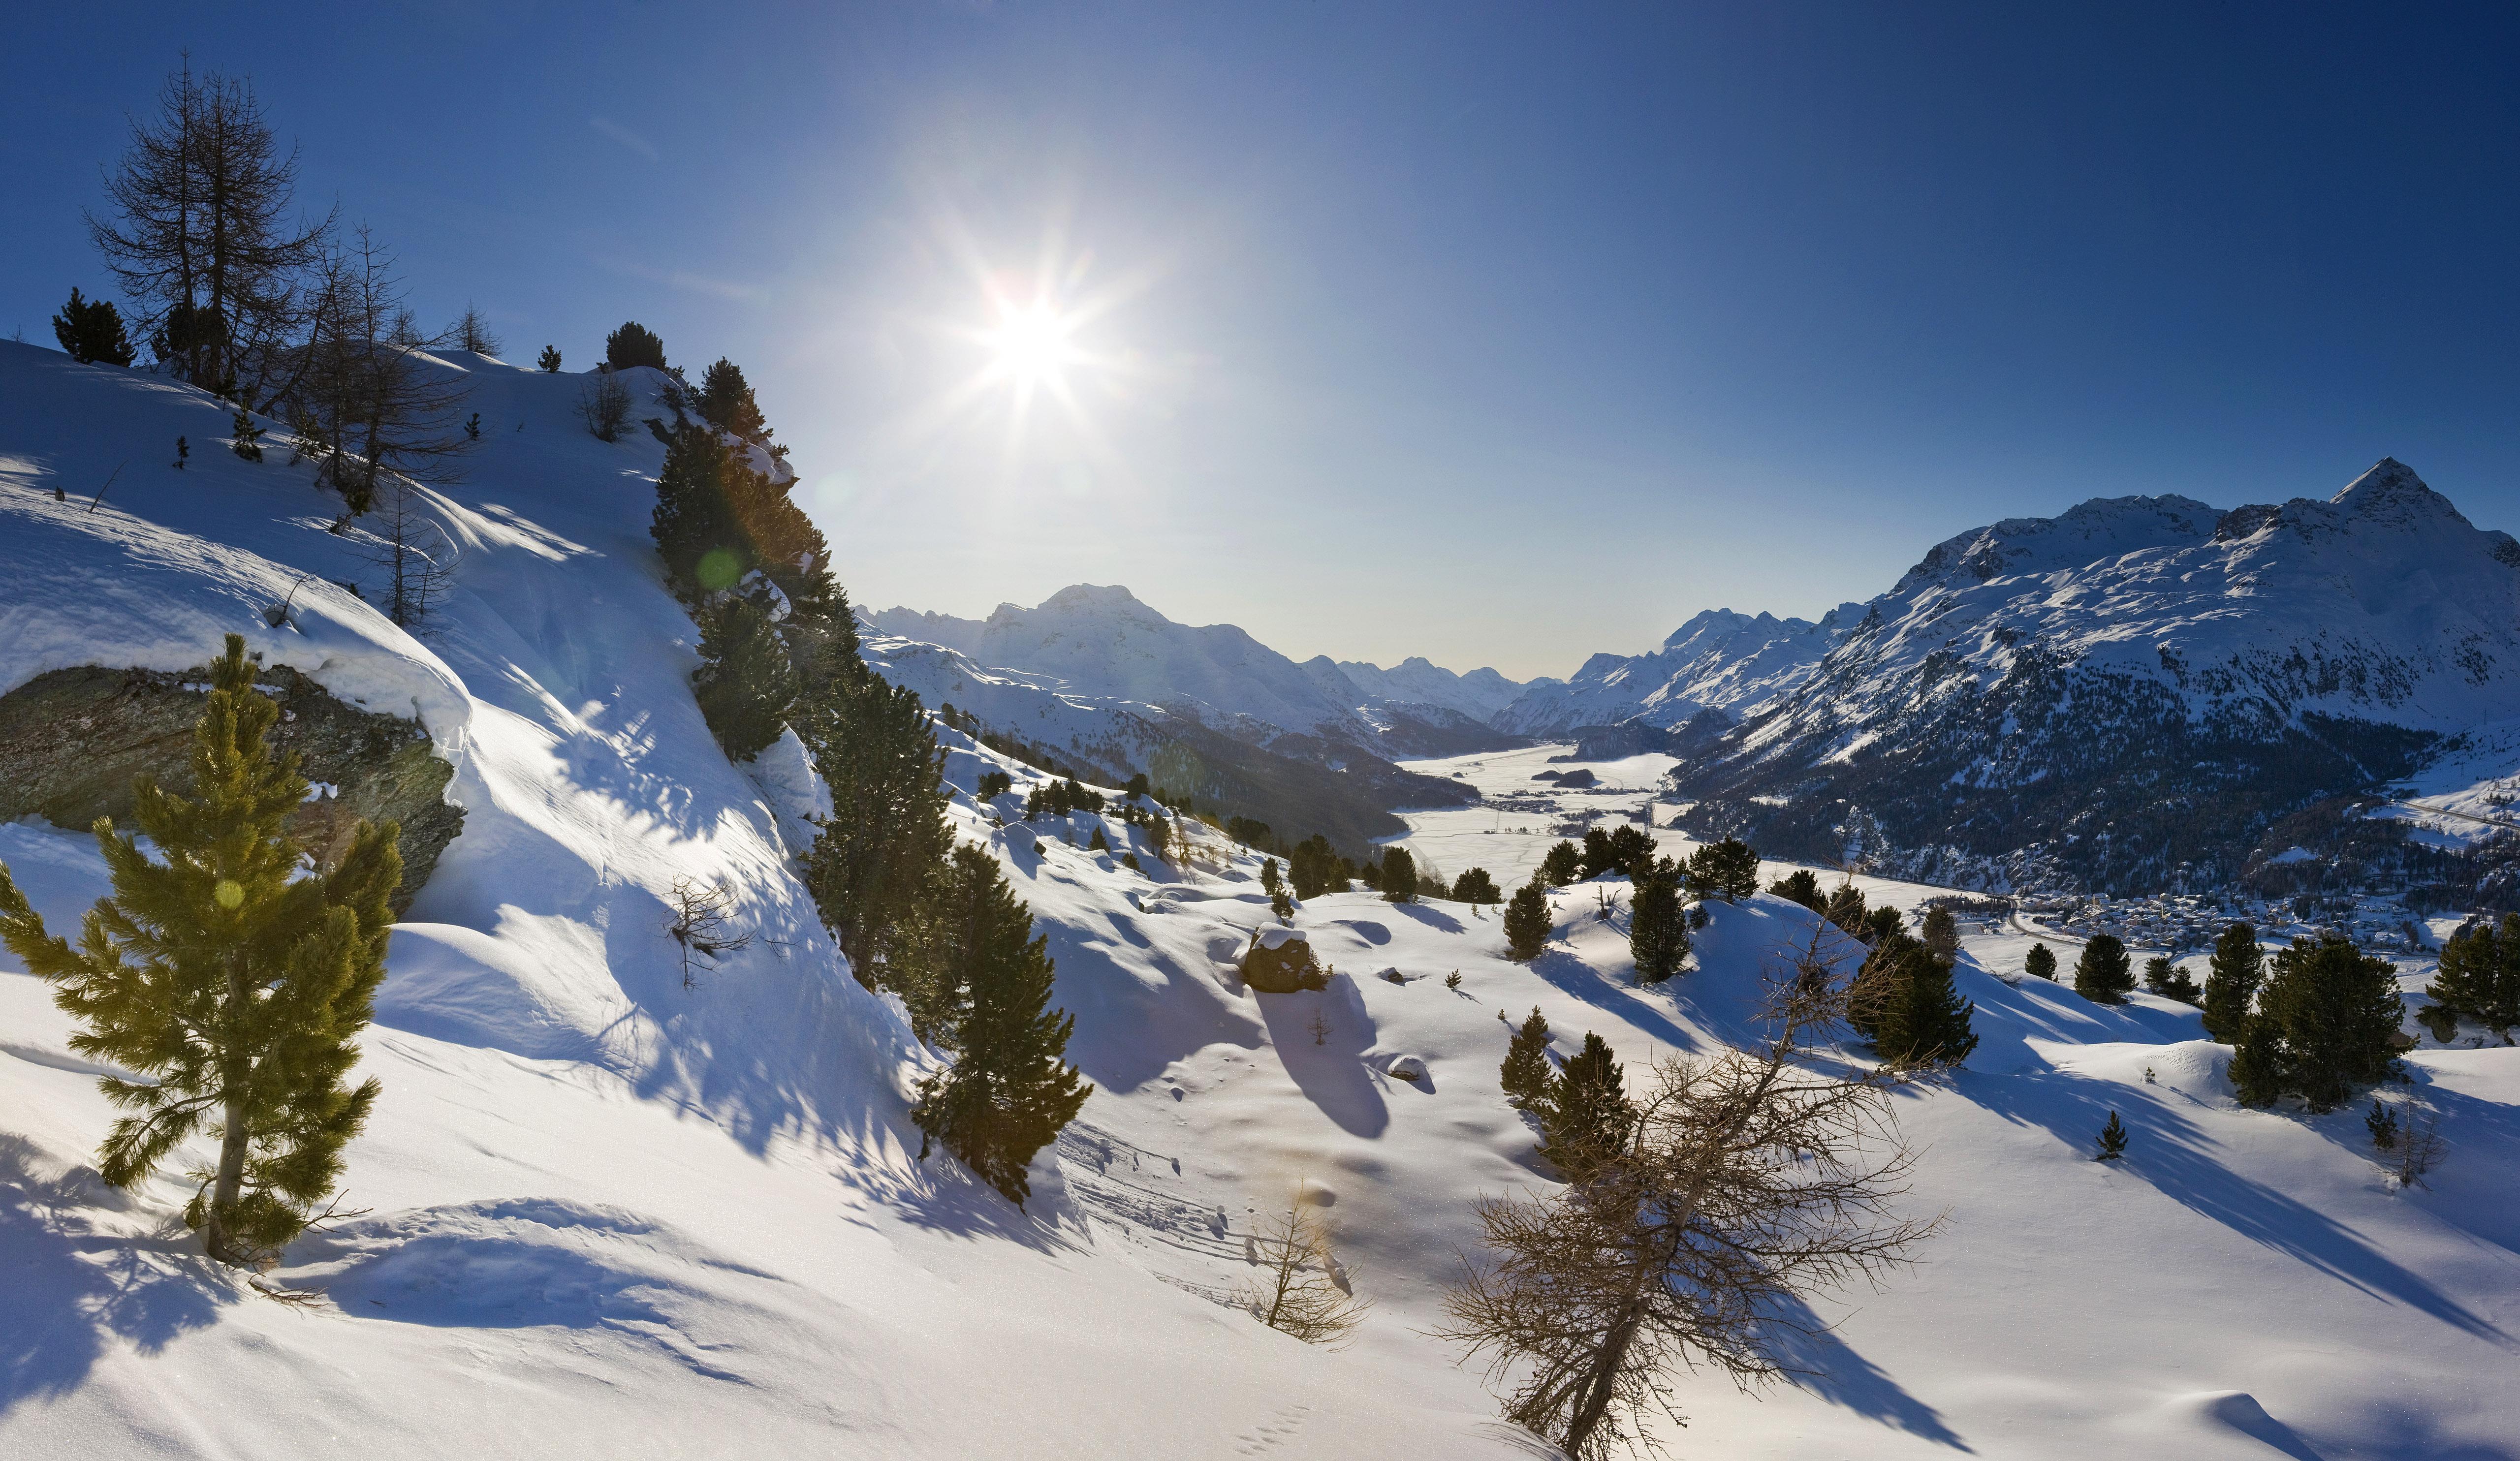 Photo: Daniel Martinek (c)Engadin St. Moritz Tourismus, Silvaplana/Engadin